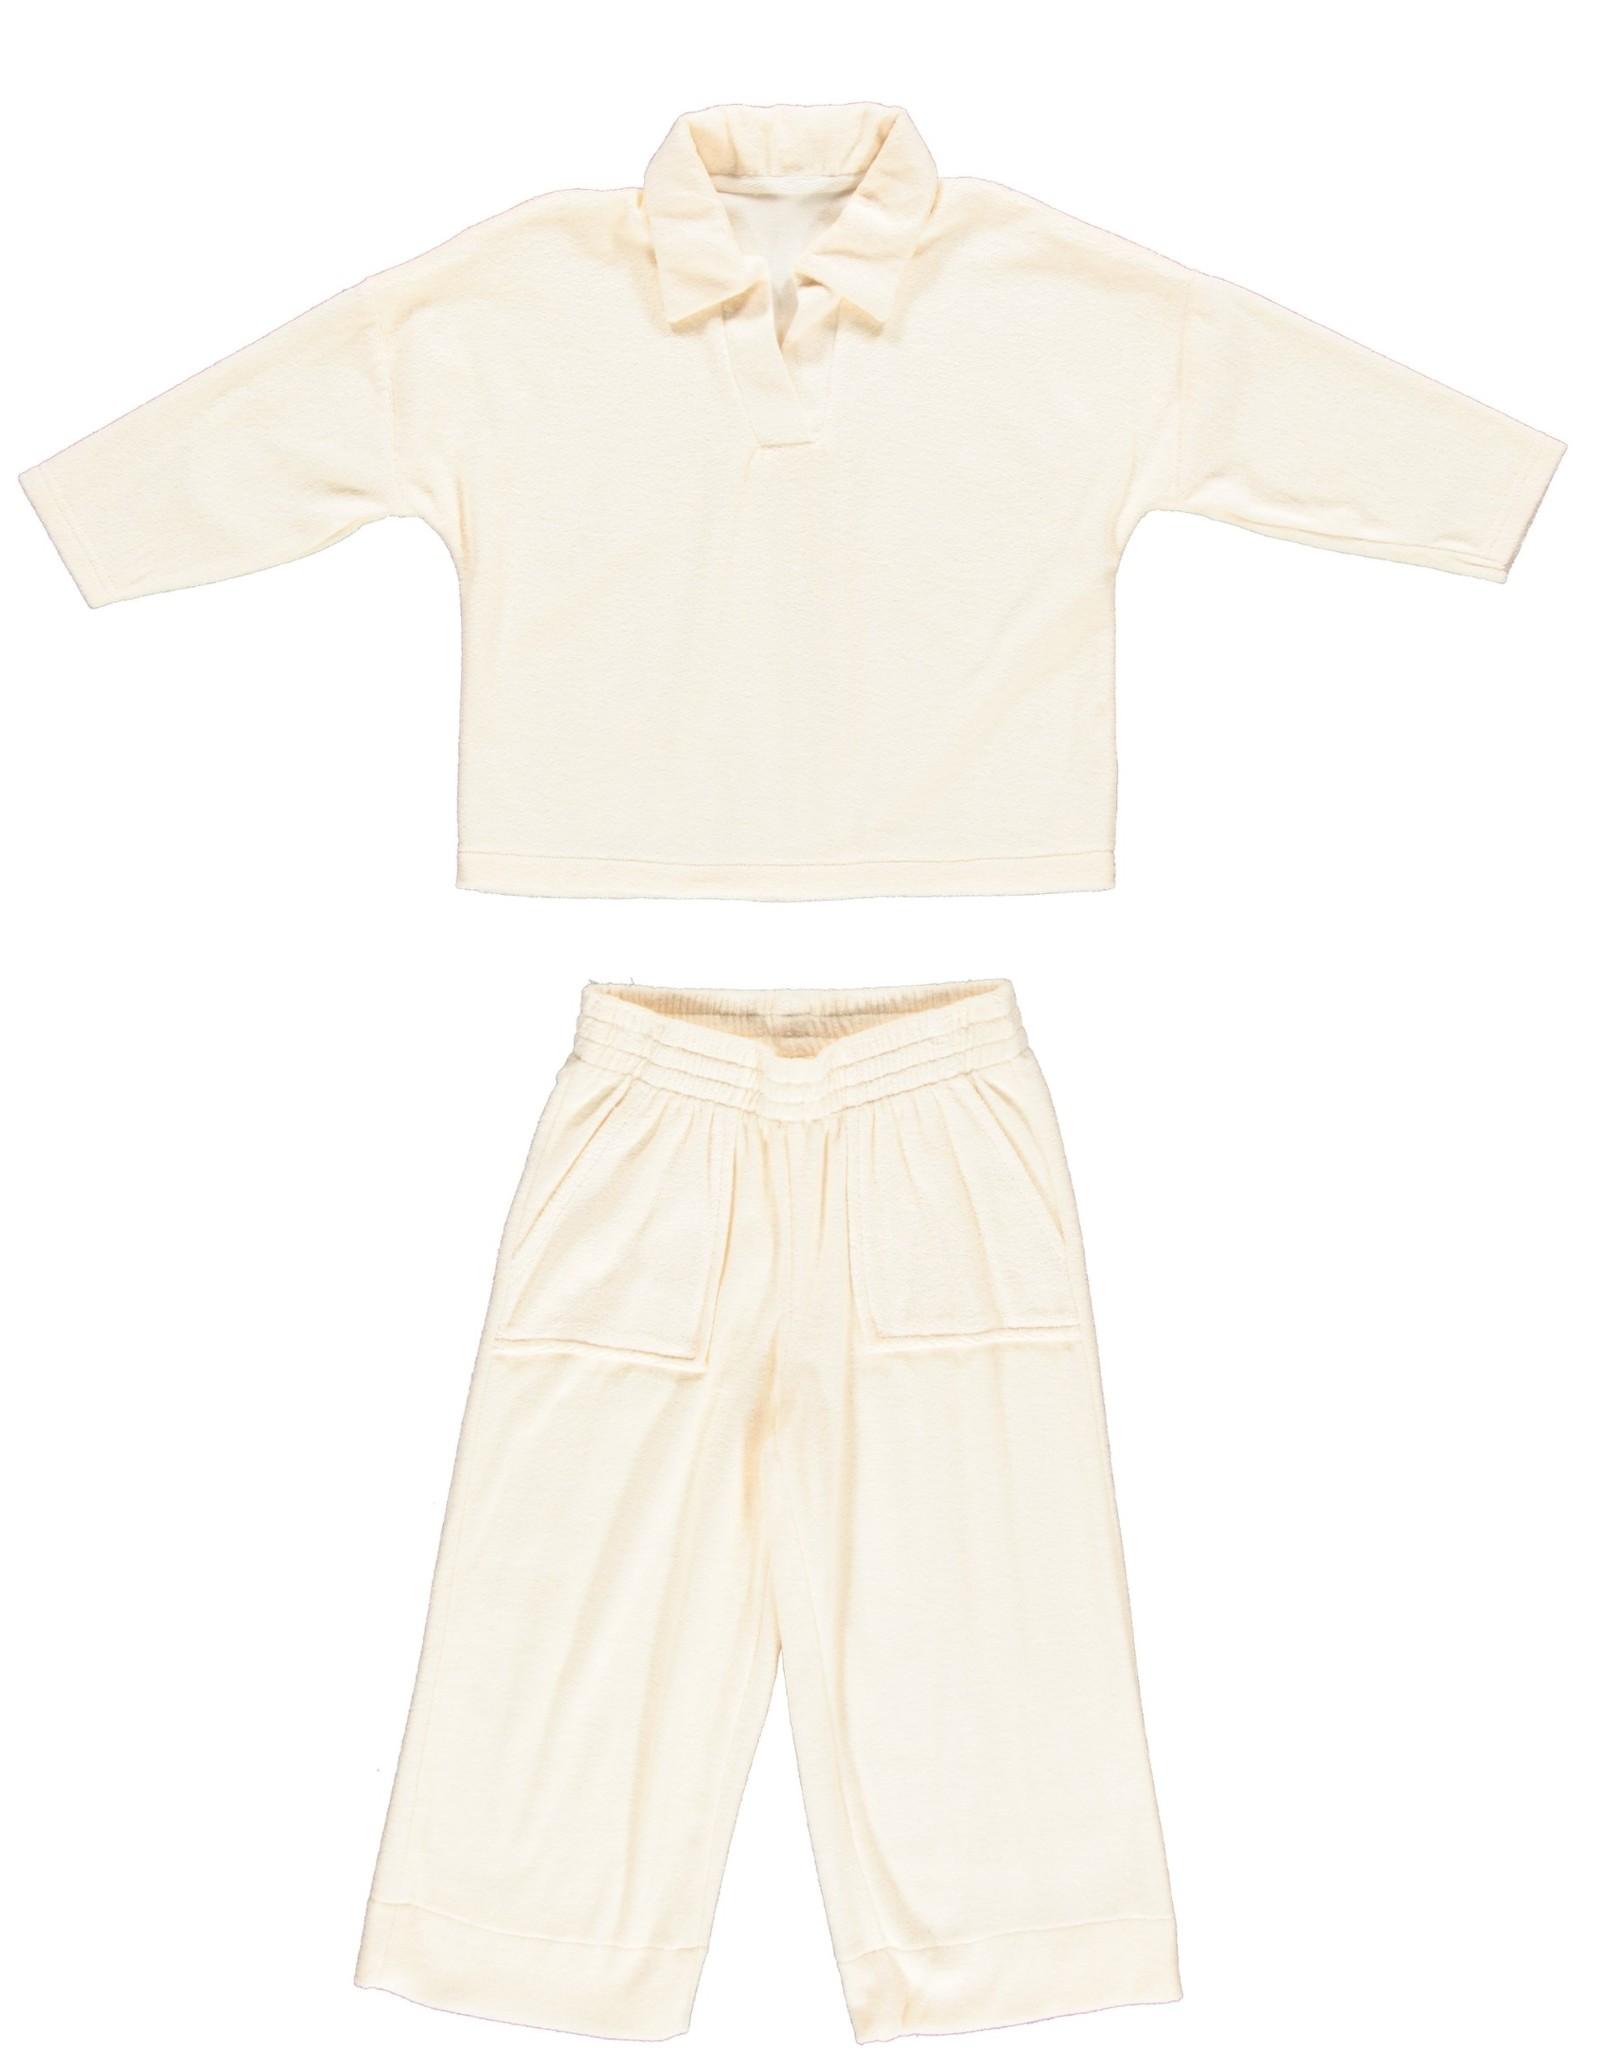 Dorélit Fanny + Flora | Pajama Set Terry | Offwhite